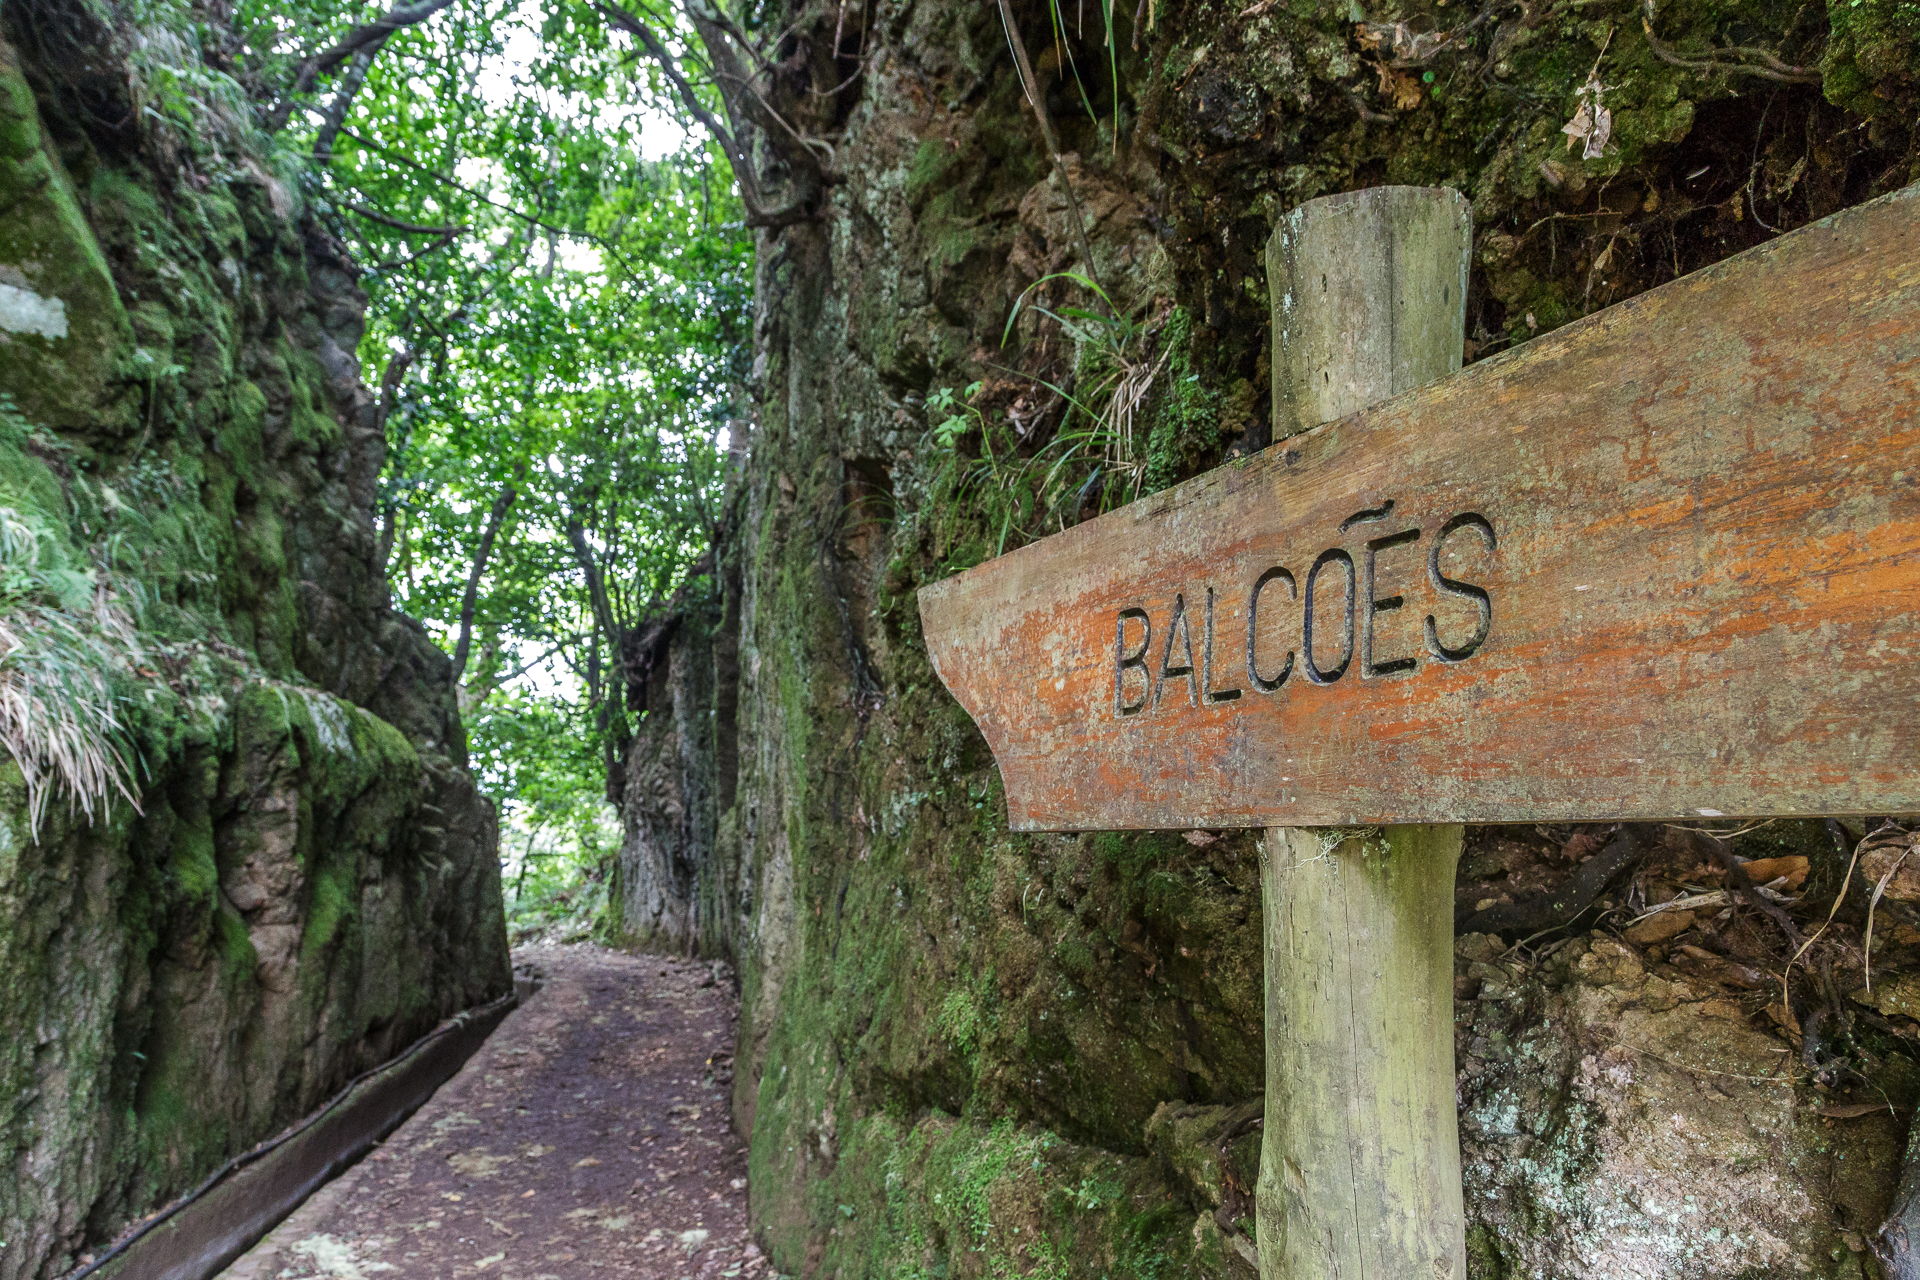 madeira-ribeiro-frio-Wanderung-Balcoes